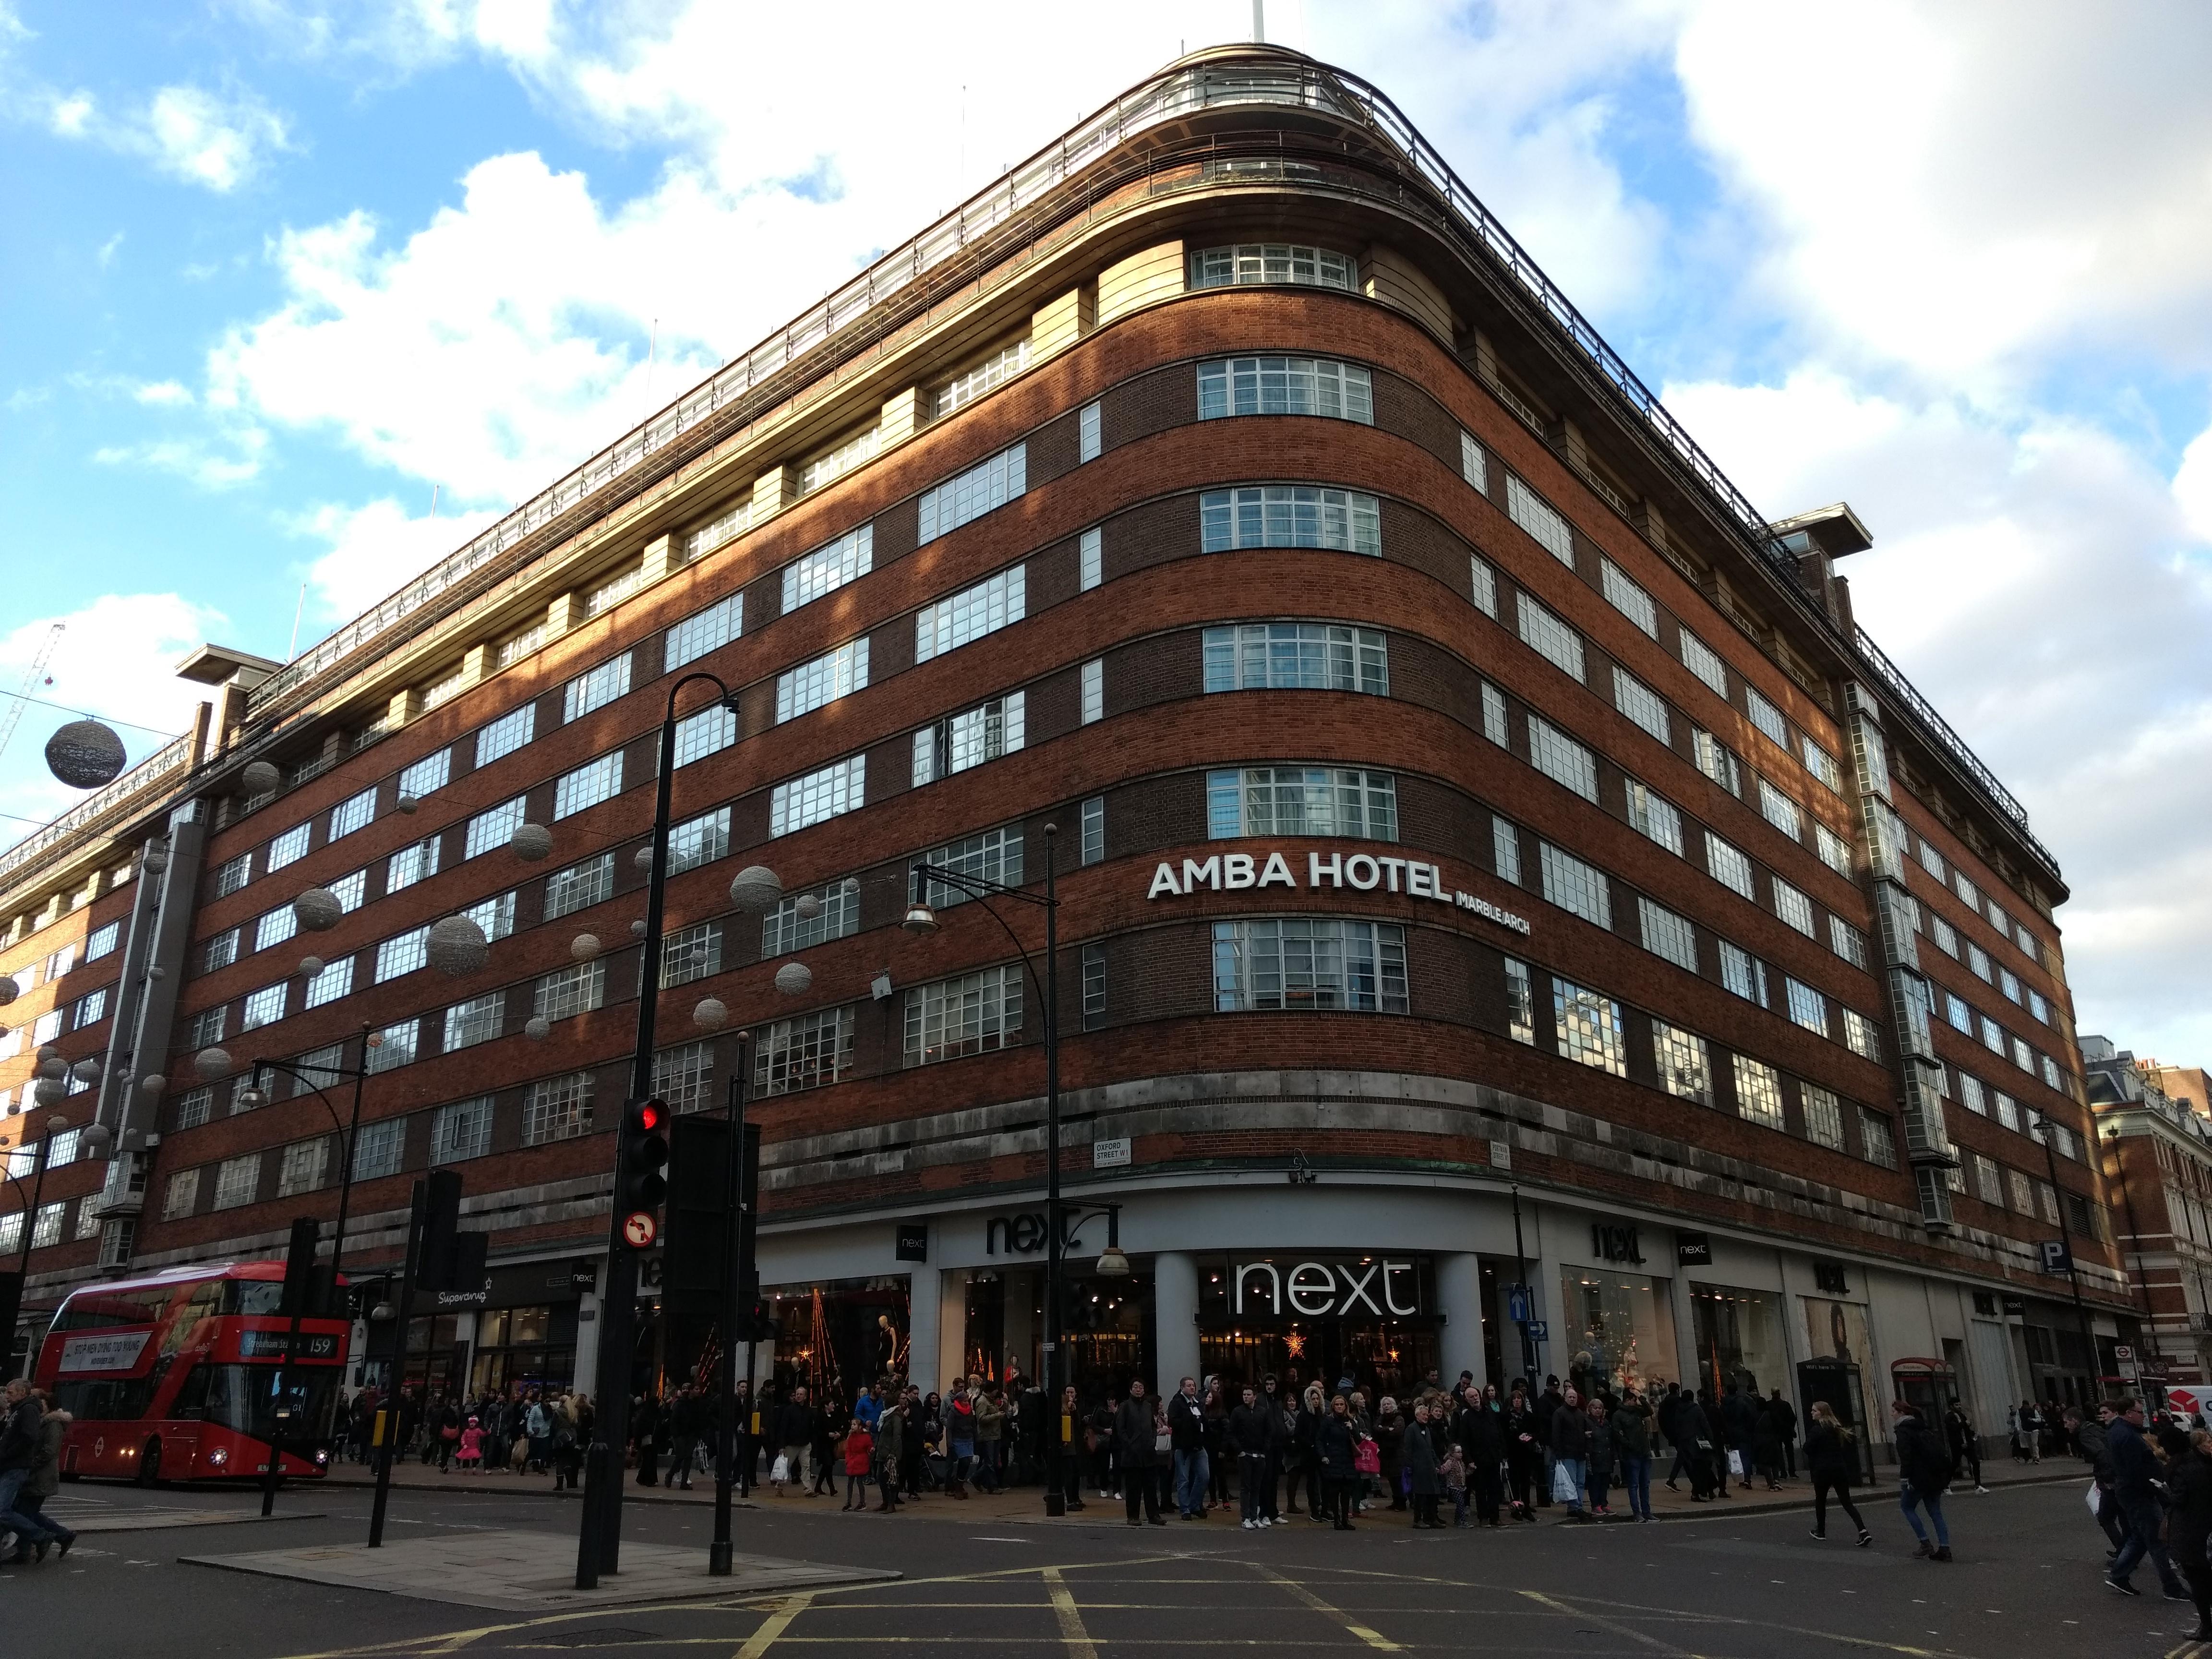 Amba Hotel Marble Arch Bryanston St Marylebone London Wh Eh